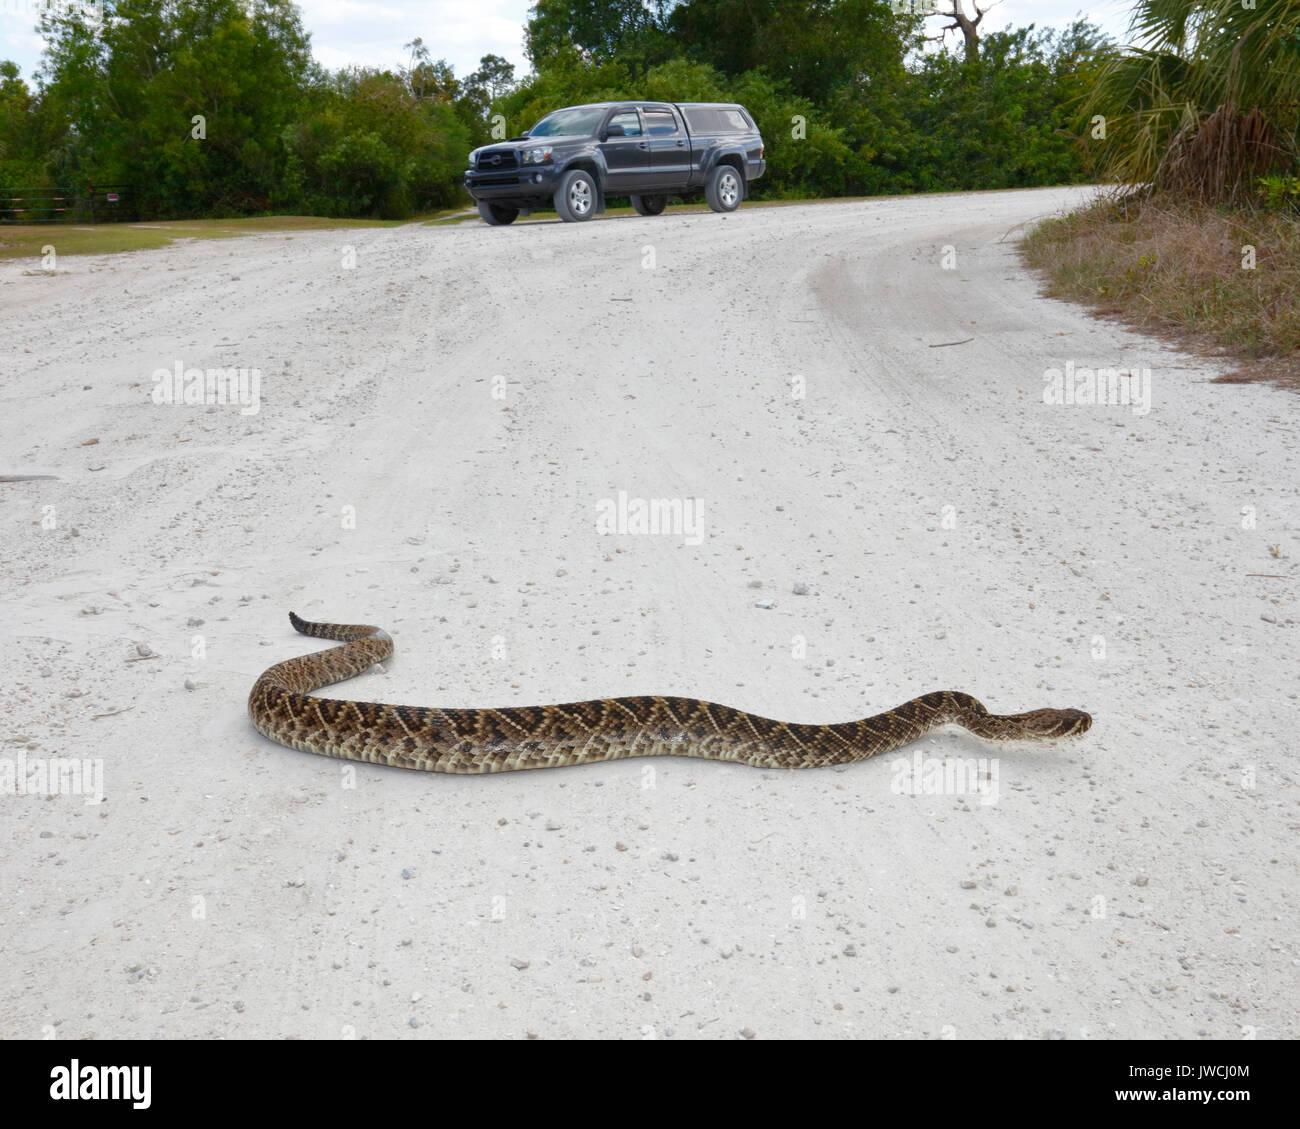 A long eastern diamondback rattlesnake, Crotalus adamanteus, is crossing a sand road. Stock Photo